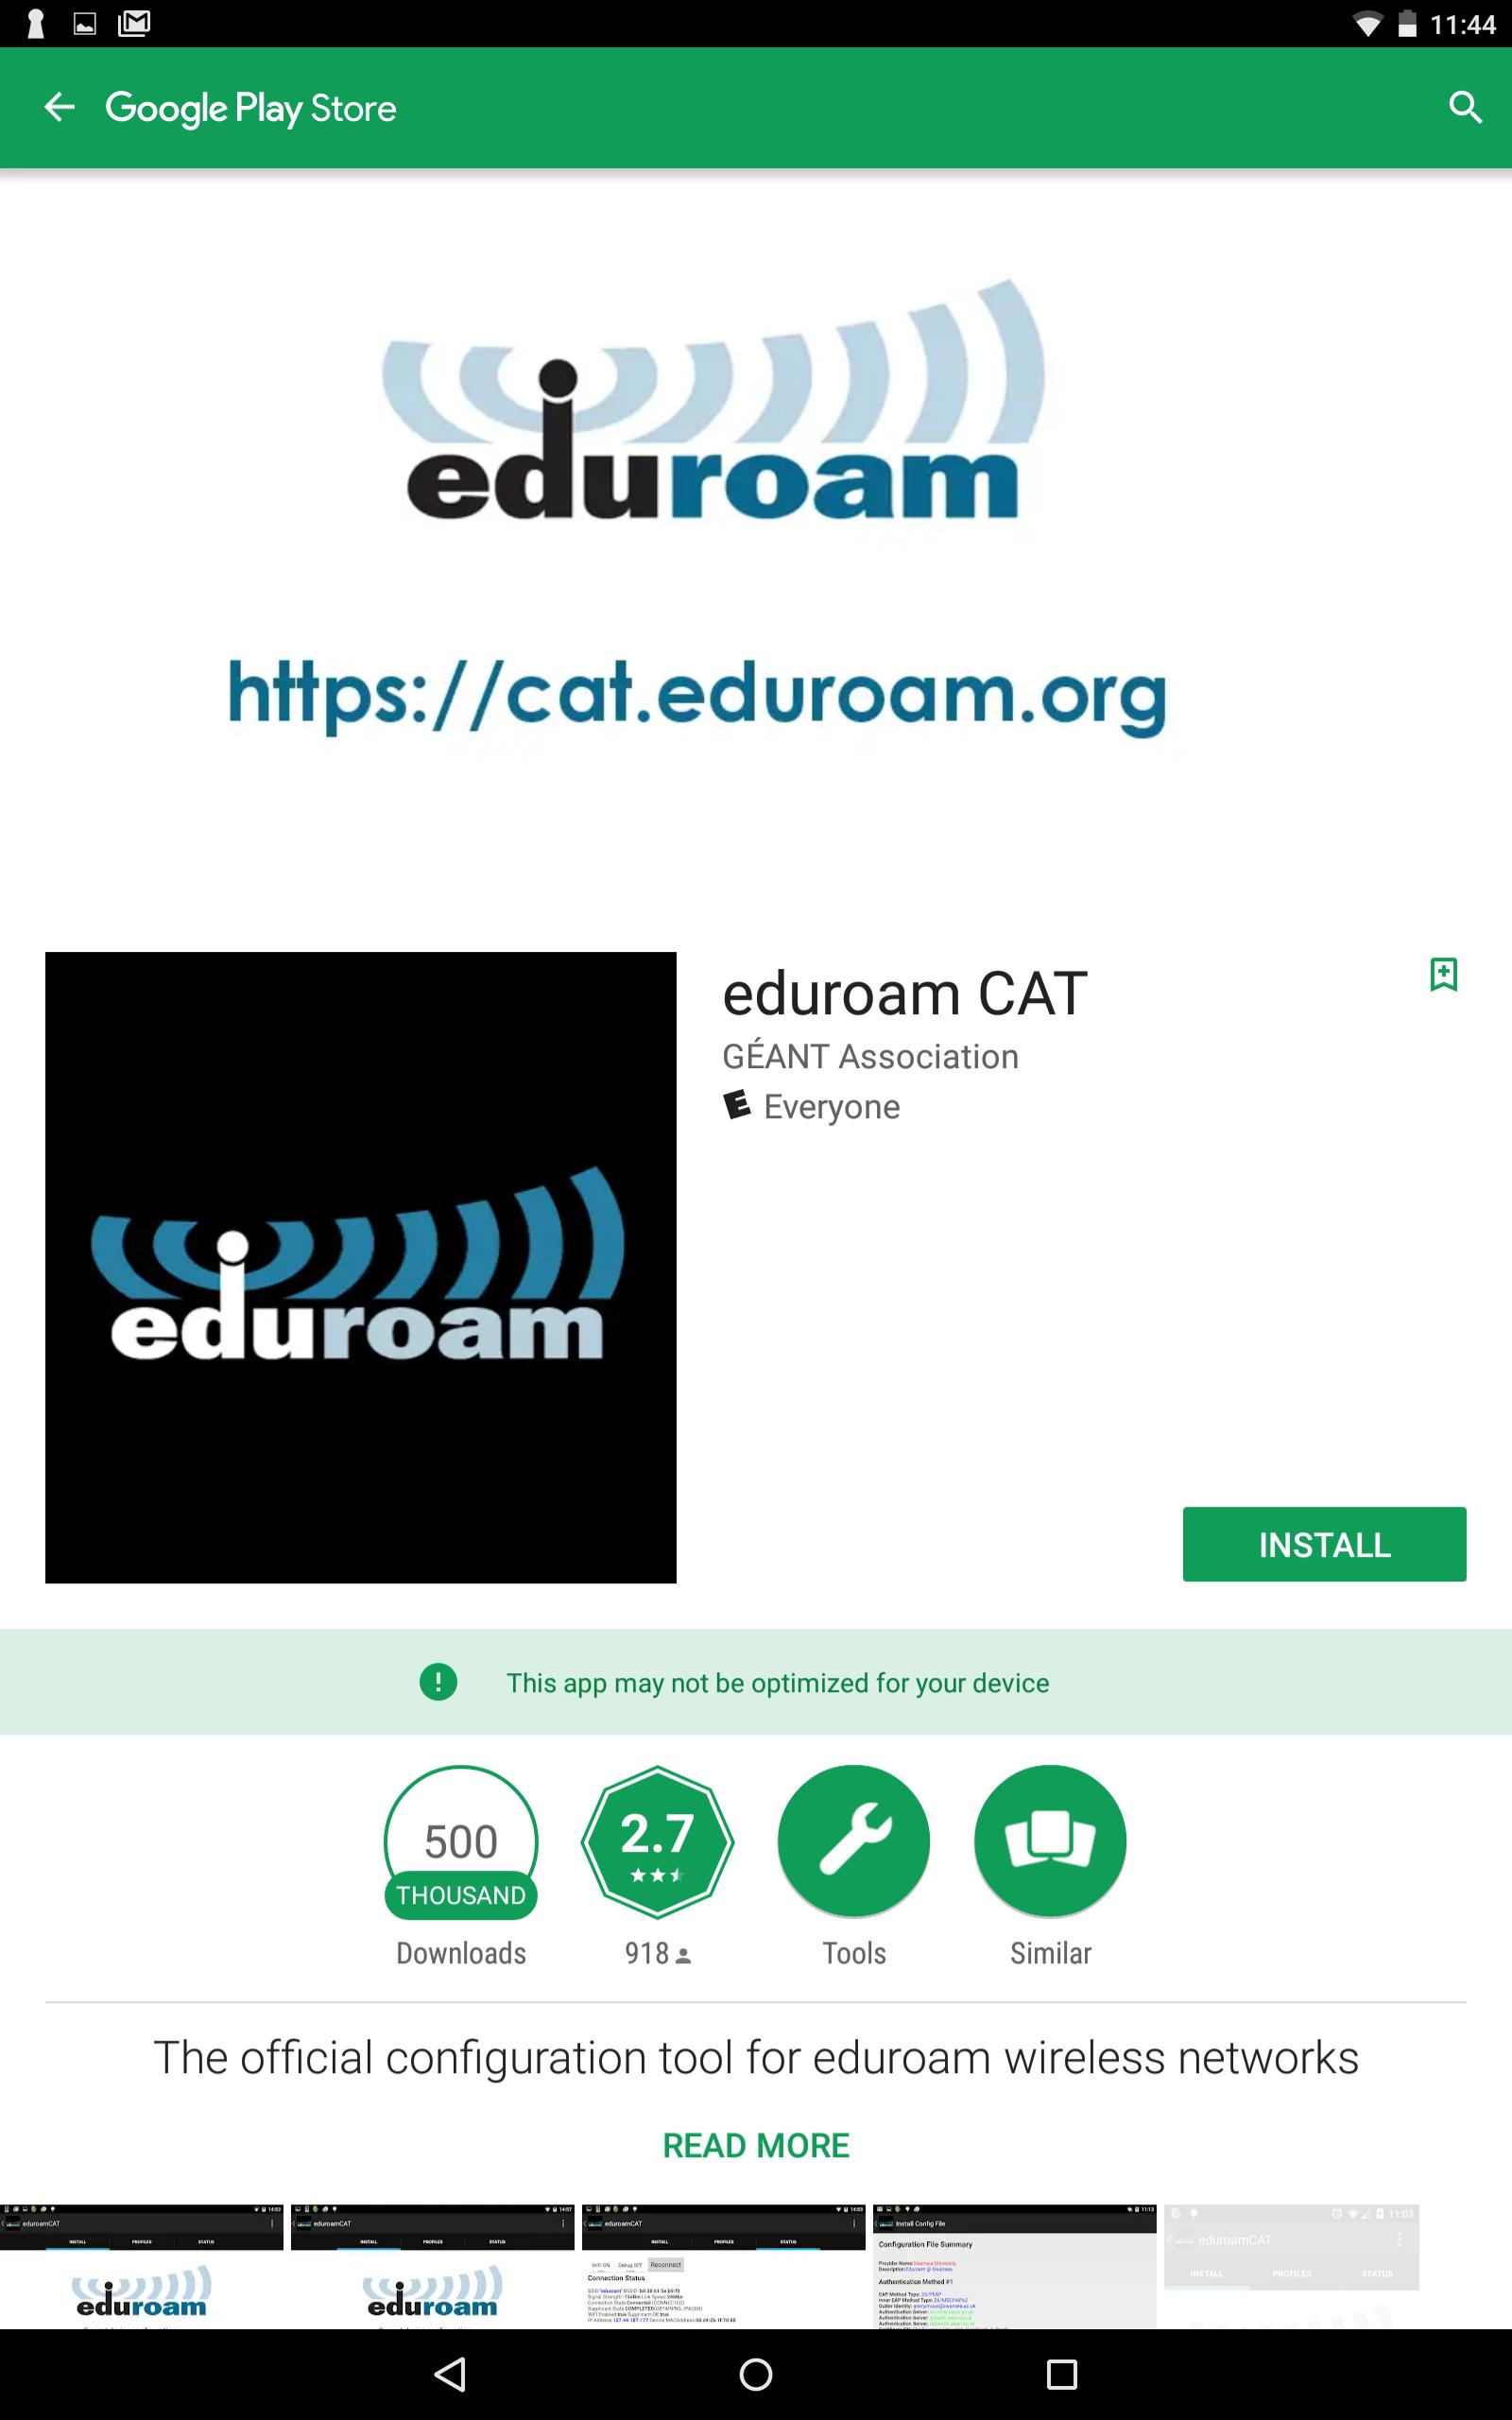 eduroam app in google play store